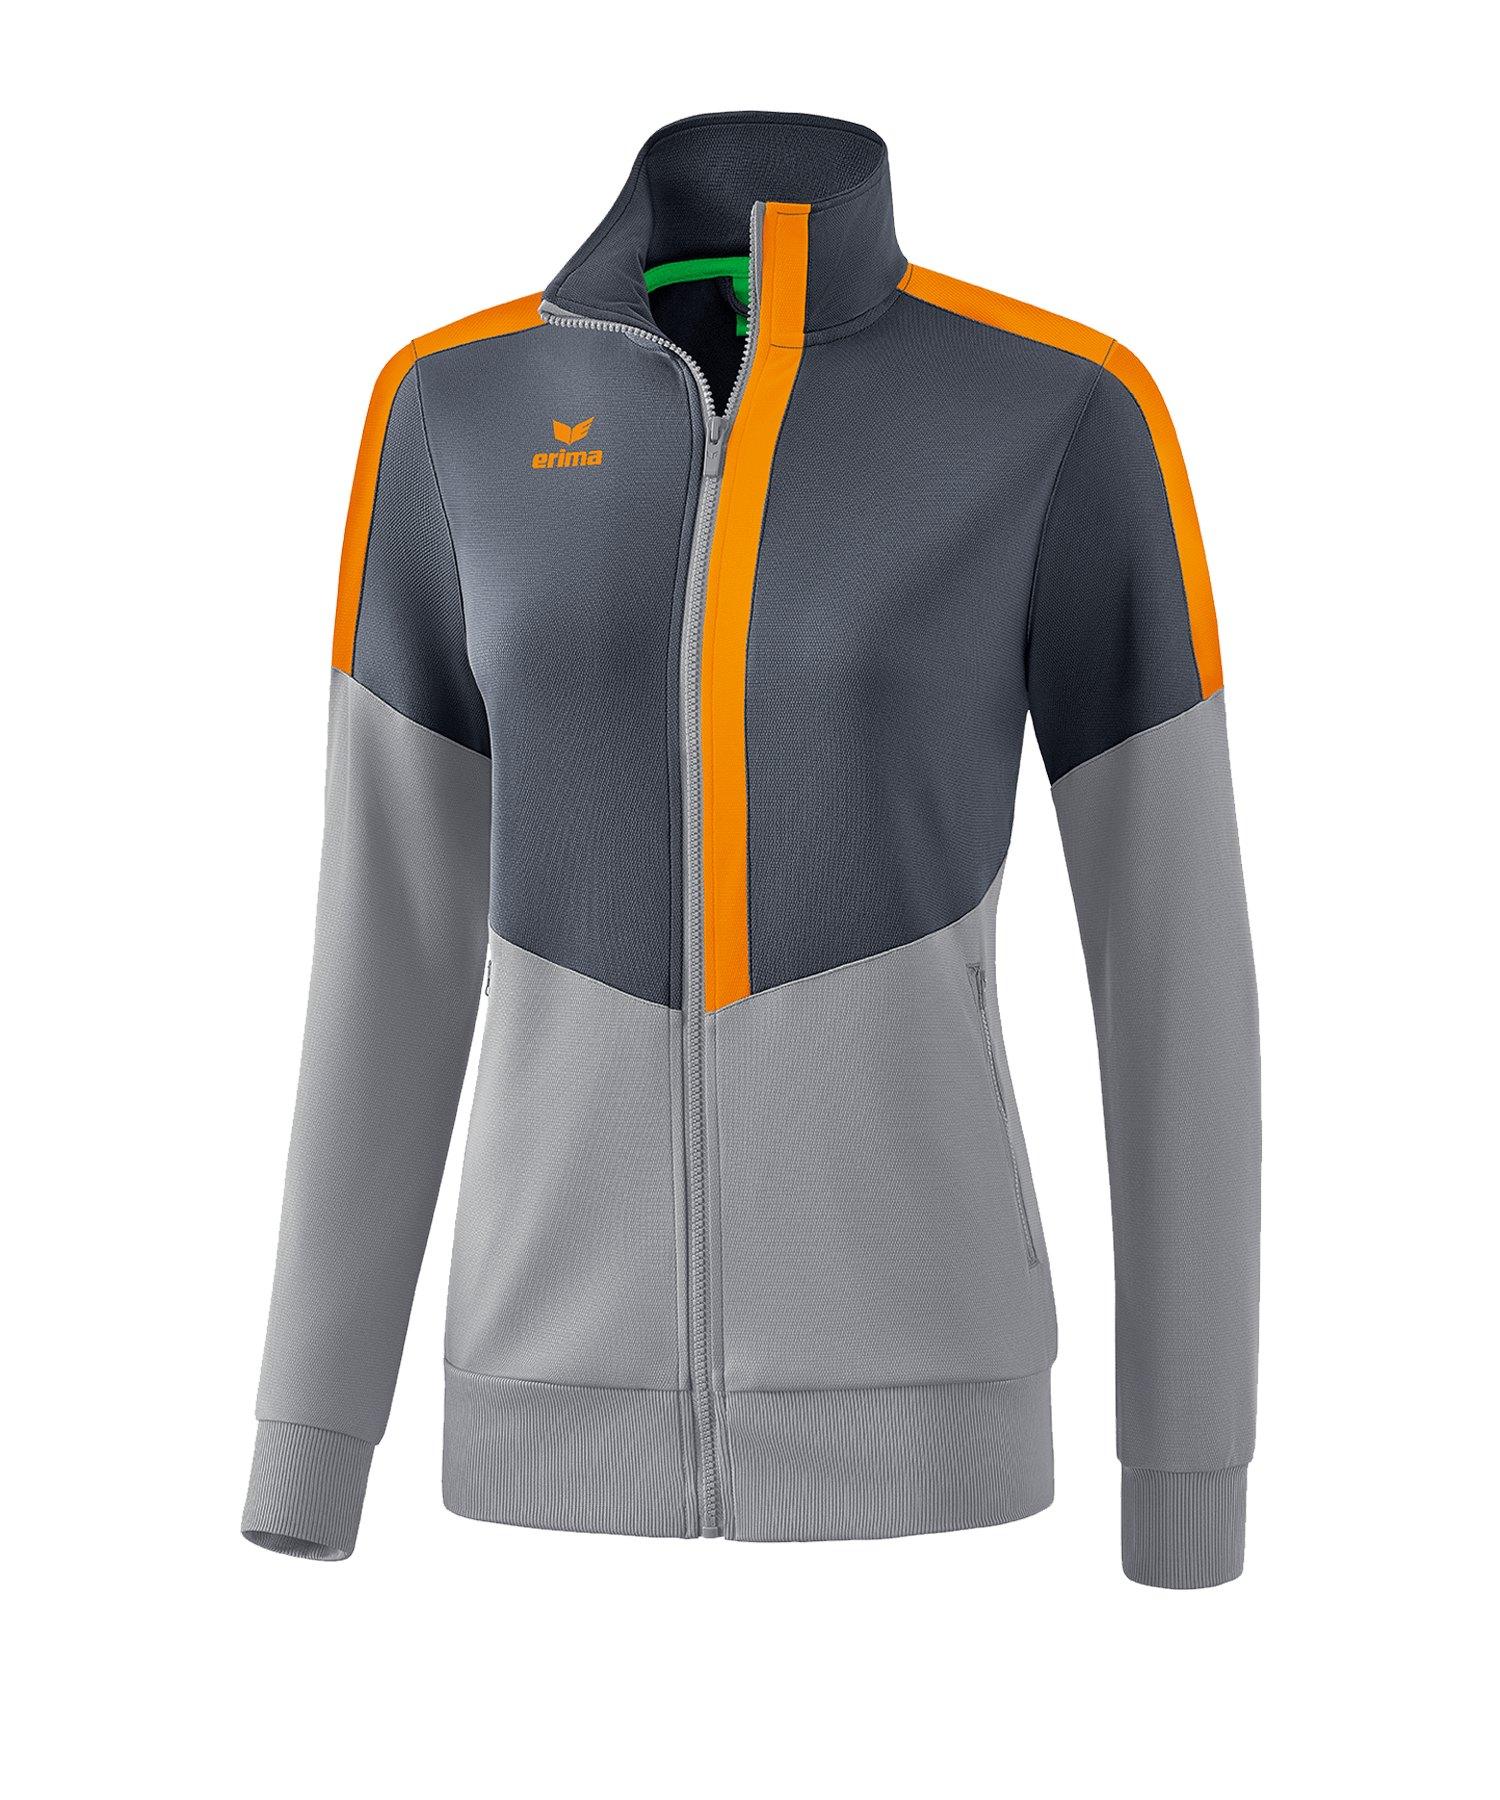 Erima Squad Trainingsjacke Damen Grau Orange - grau